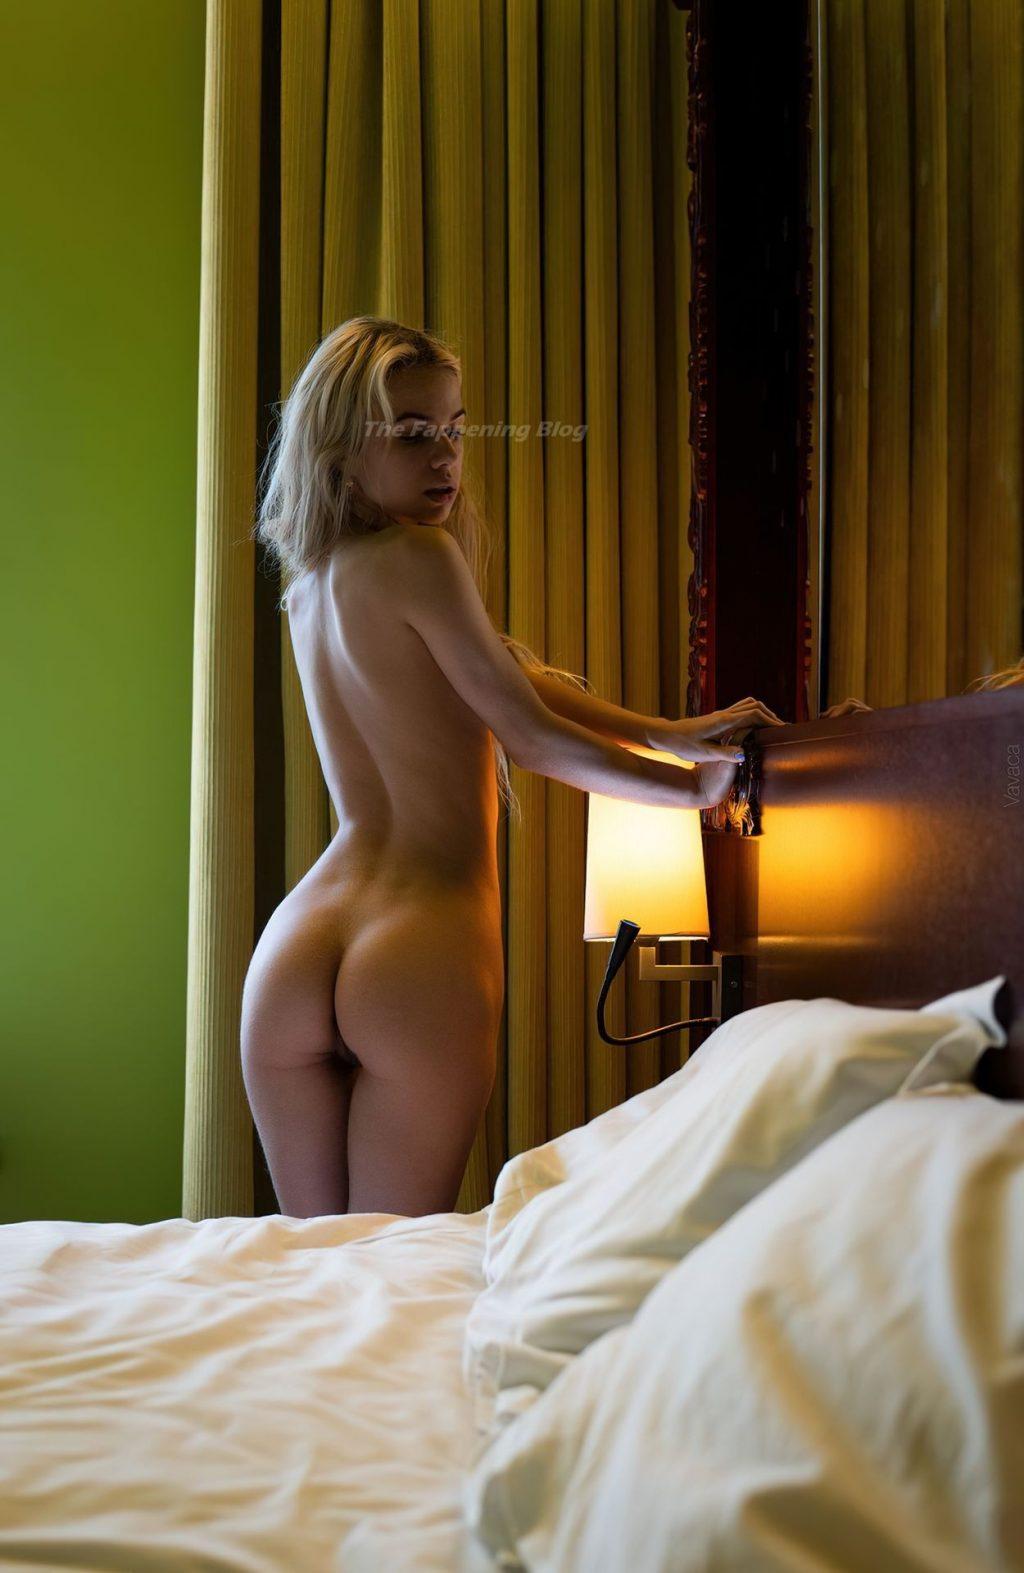 Sasha Smelova Nude (8 Photos)